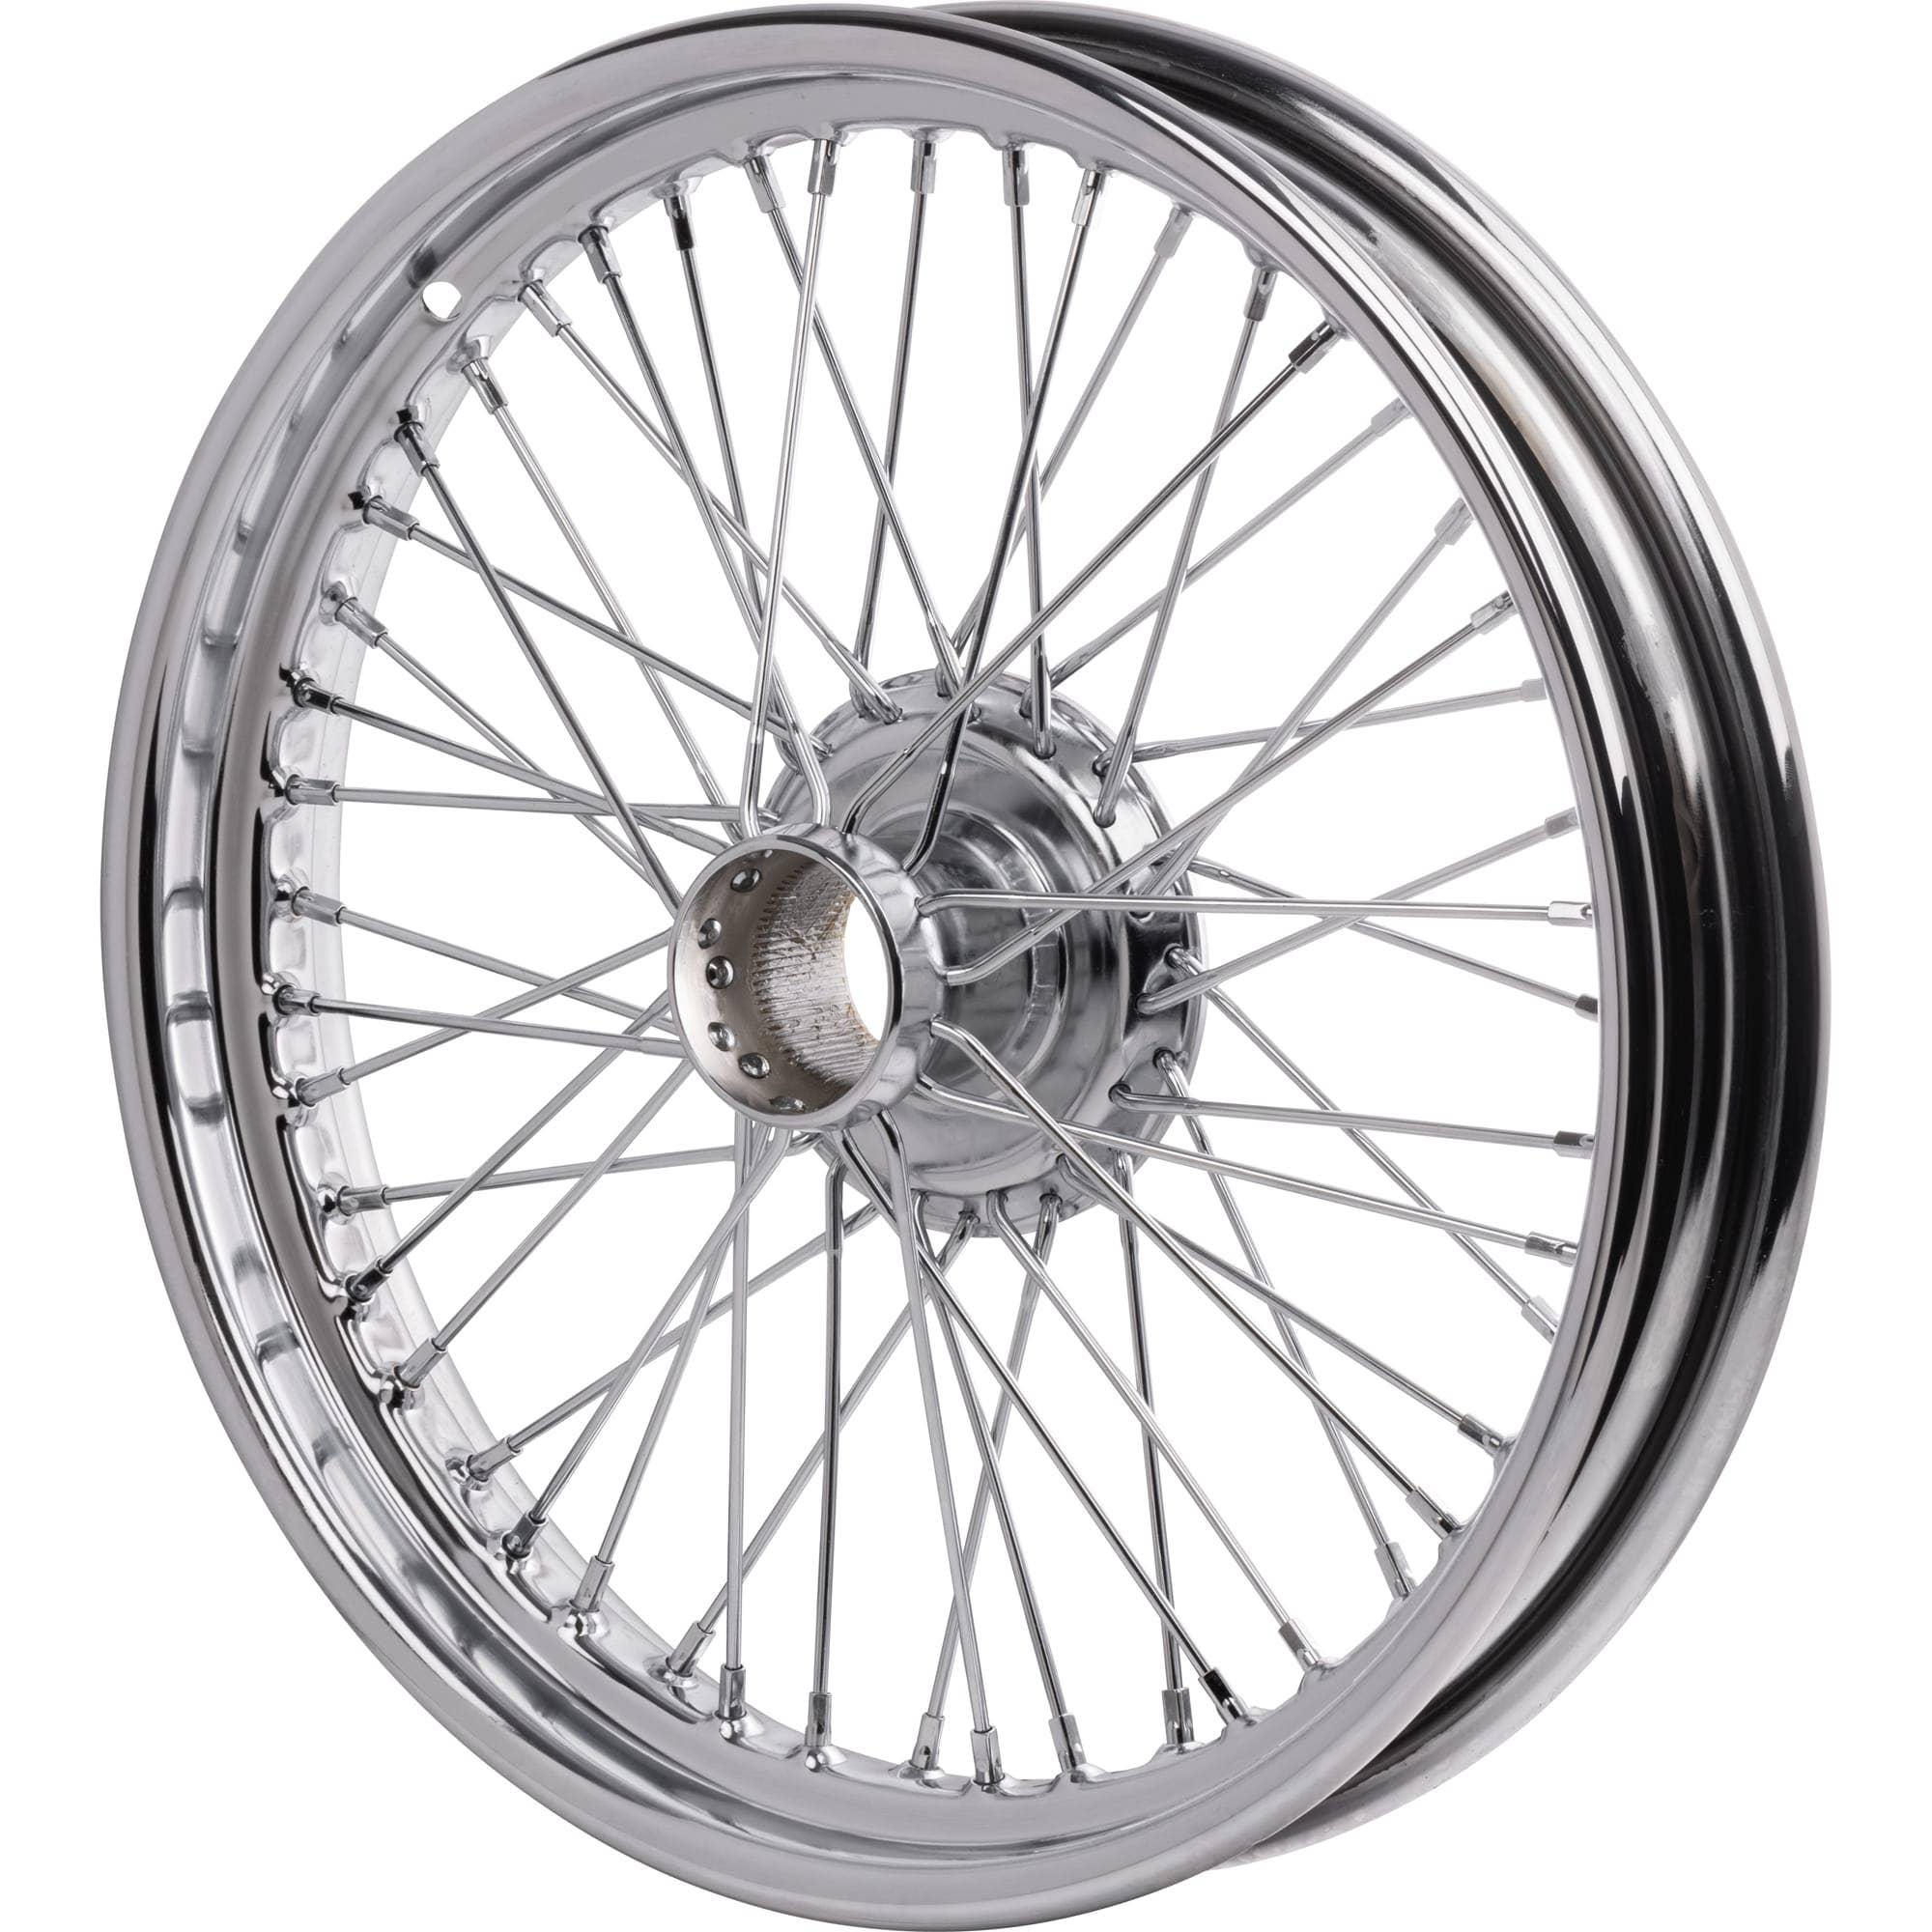 wire wheel conversion kit mg td tf wheels knockoffs wheels MG TD Serious Wheels wire wheel chrome 19 x2 5 48 spoke tube type mg tc